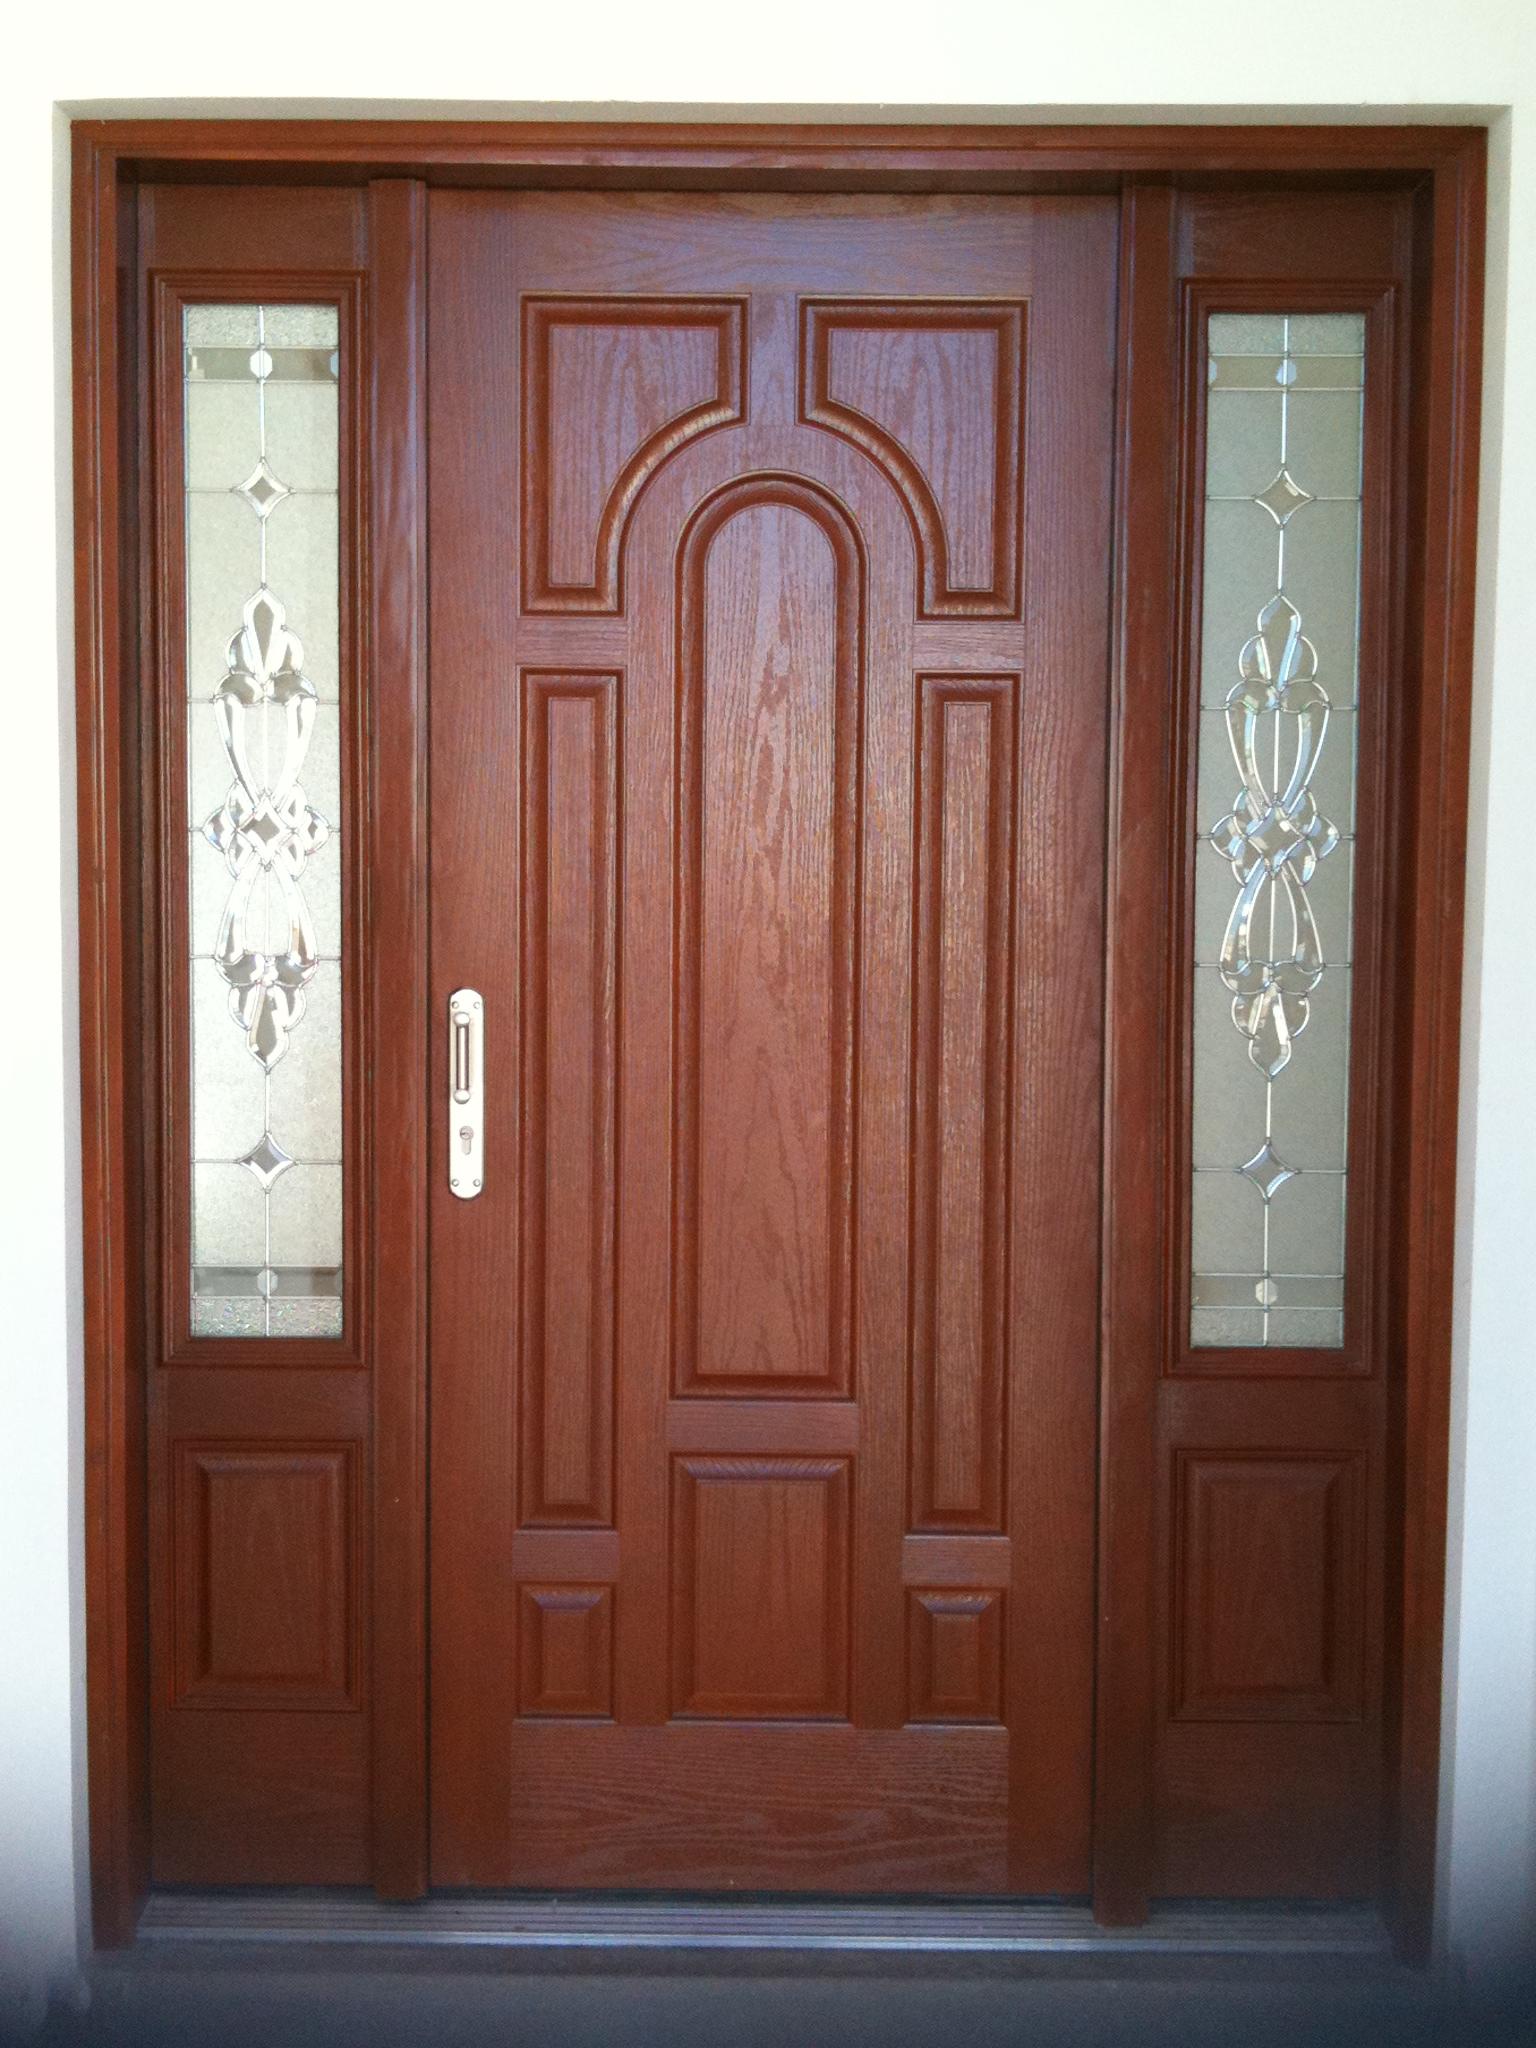 Ludicasa sa de cv chihuahua mirador 7566 614 4231 - Vidrios para puertas ...